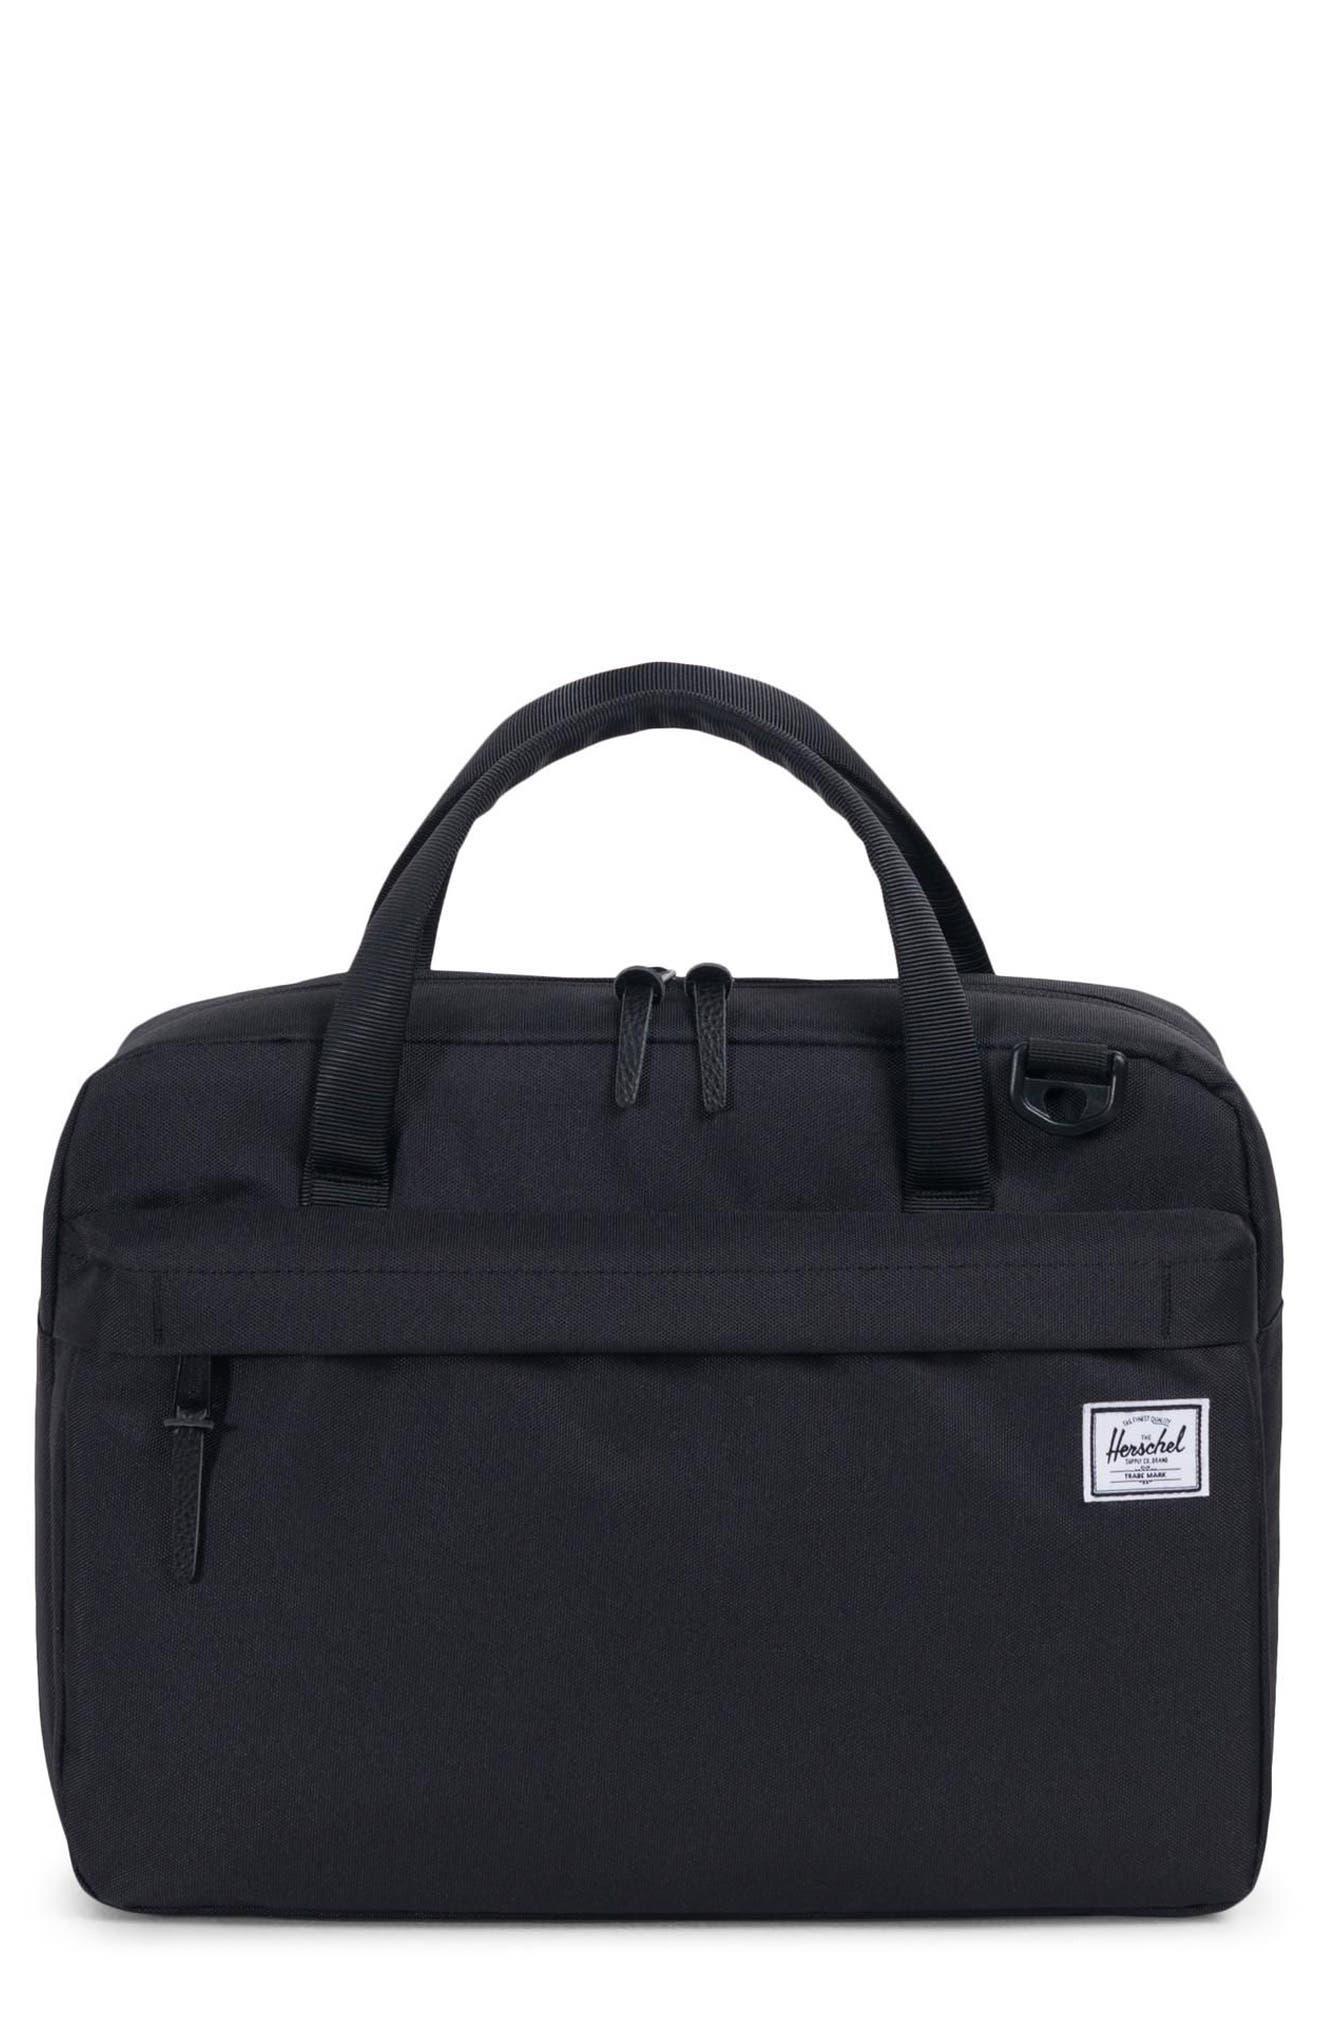 Gibson Messenger Bag,                             Main thumbnail 1, color,                             BLACK